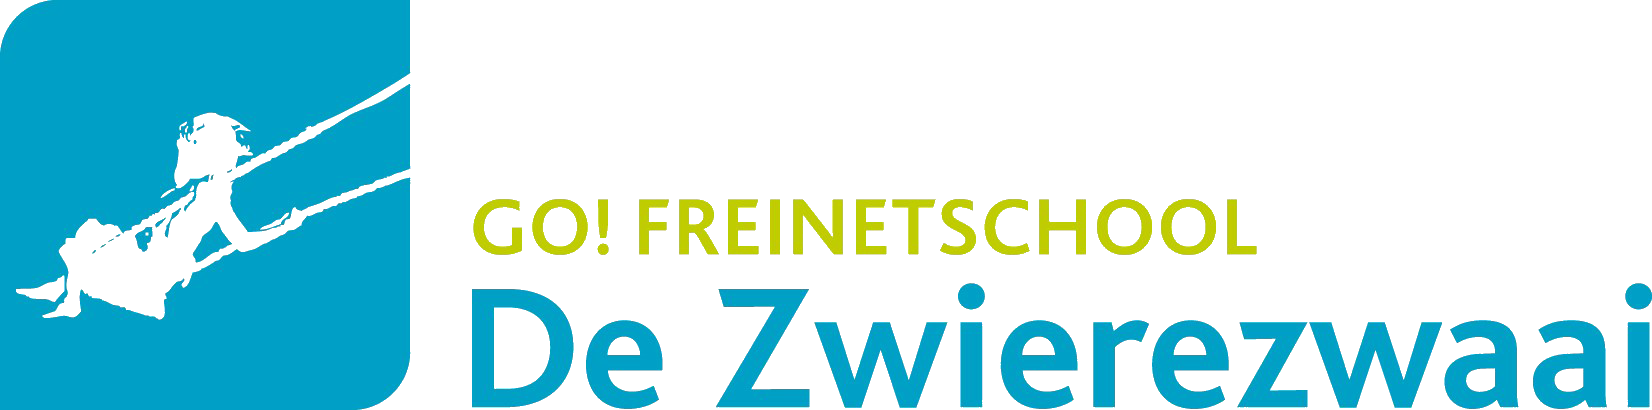 GO! freinetschool De Zwierezwaai